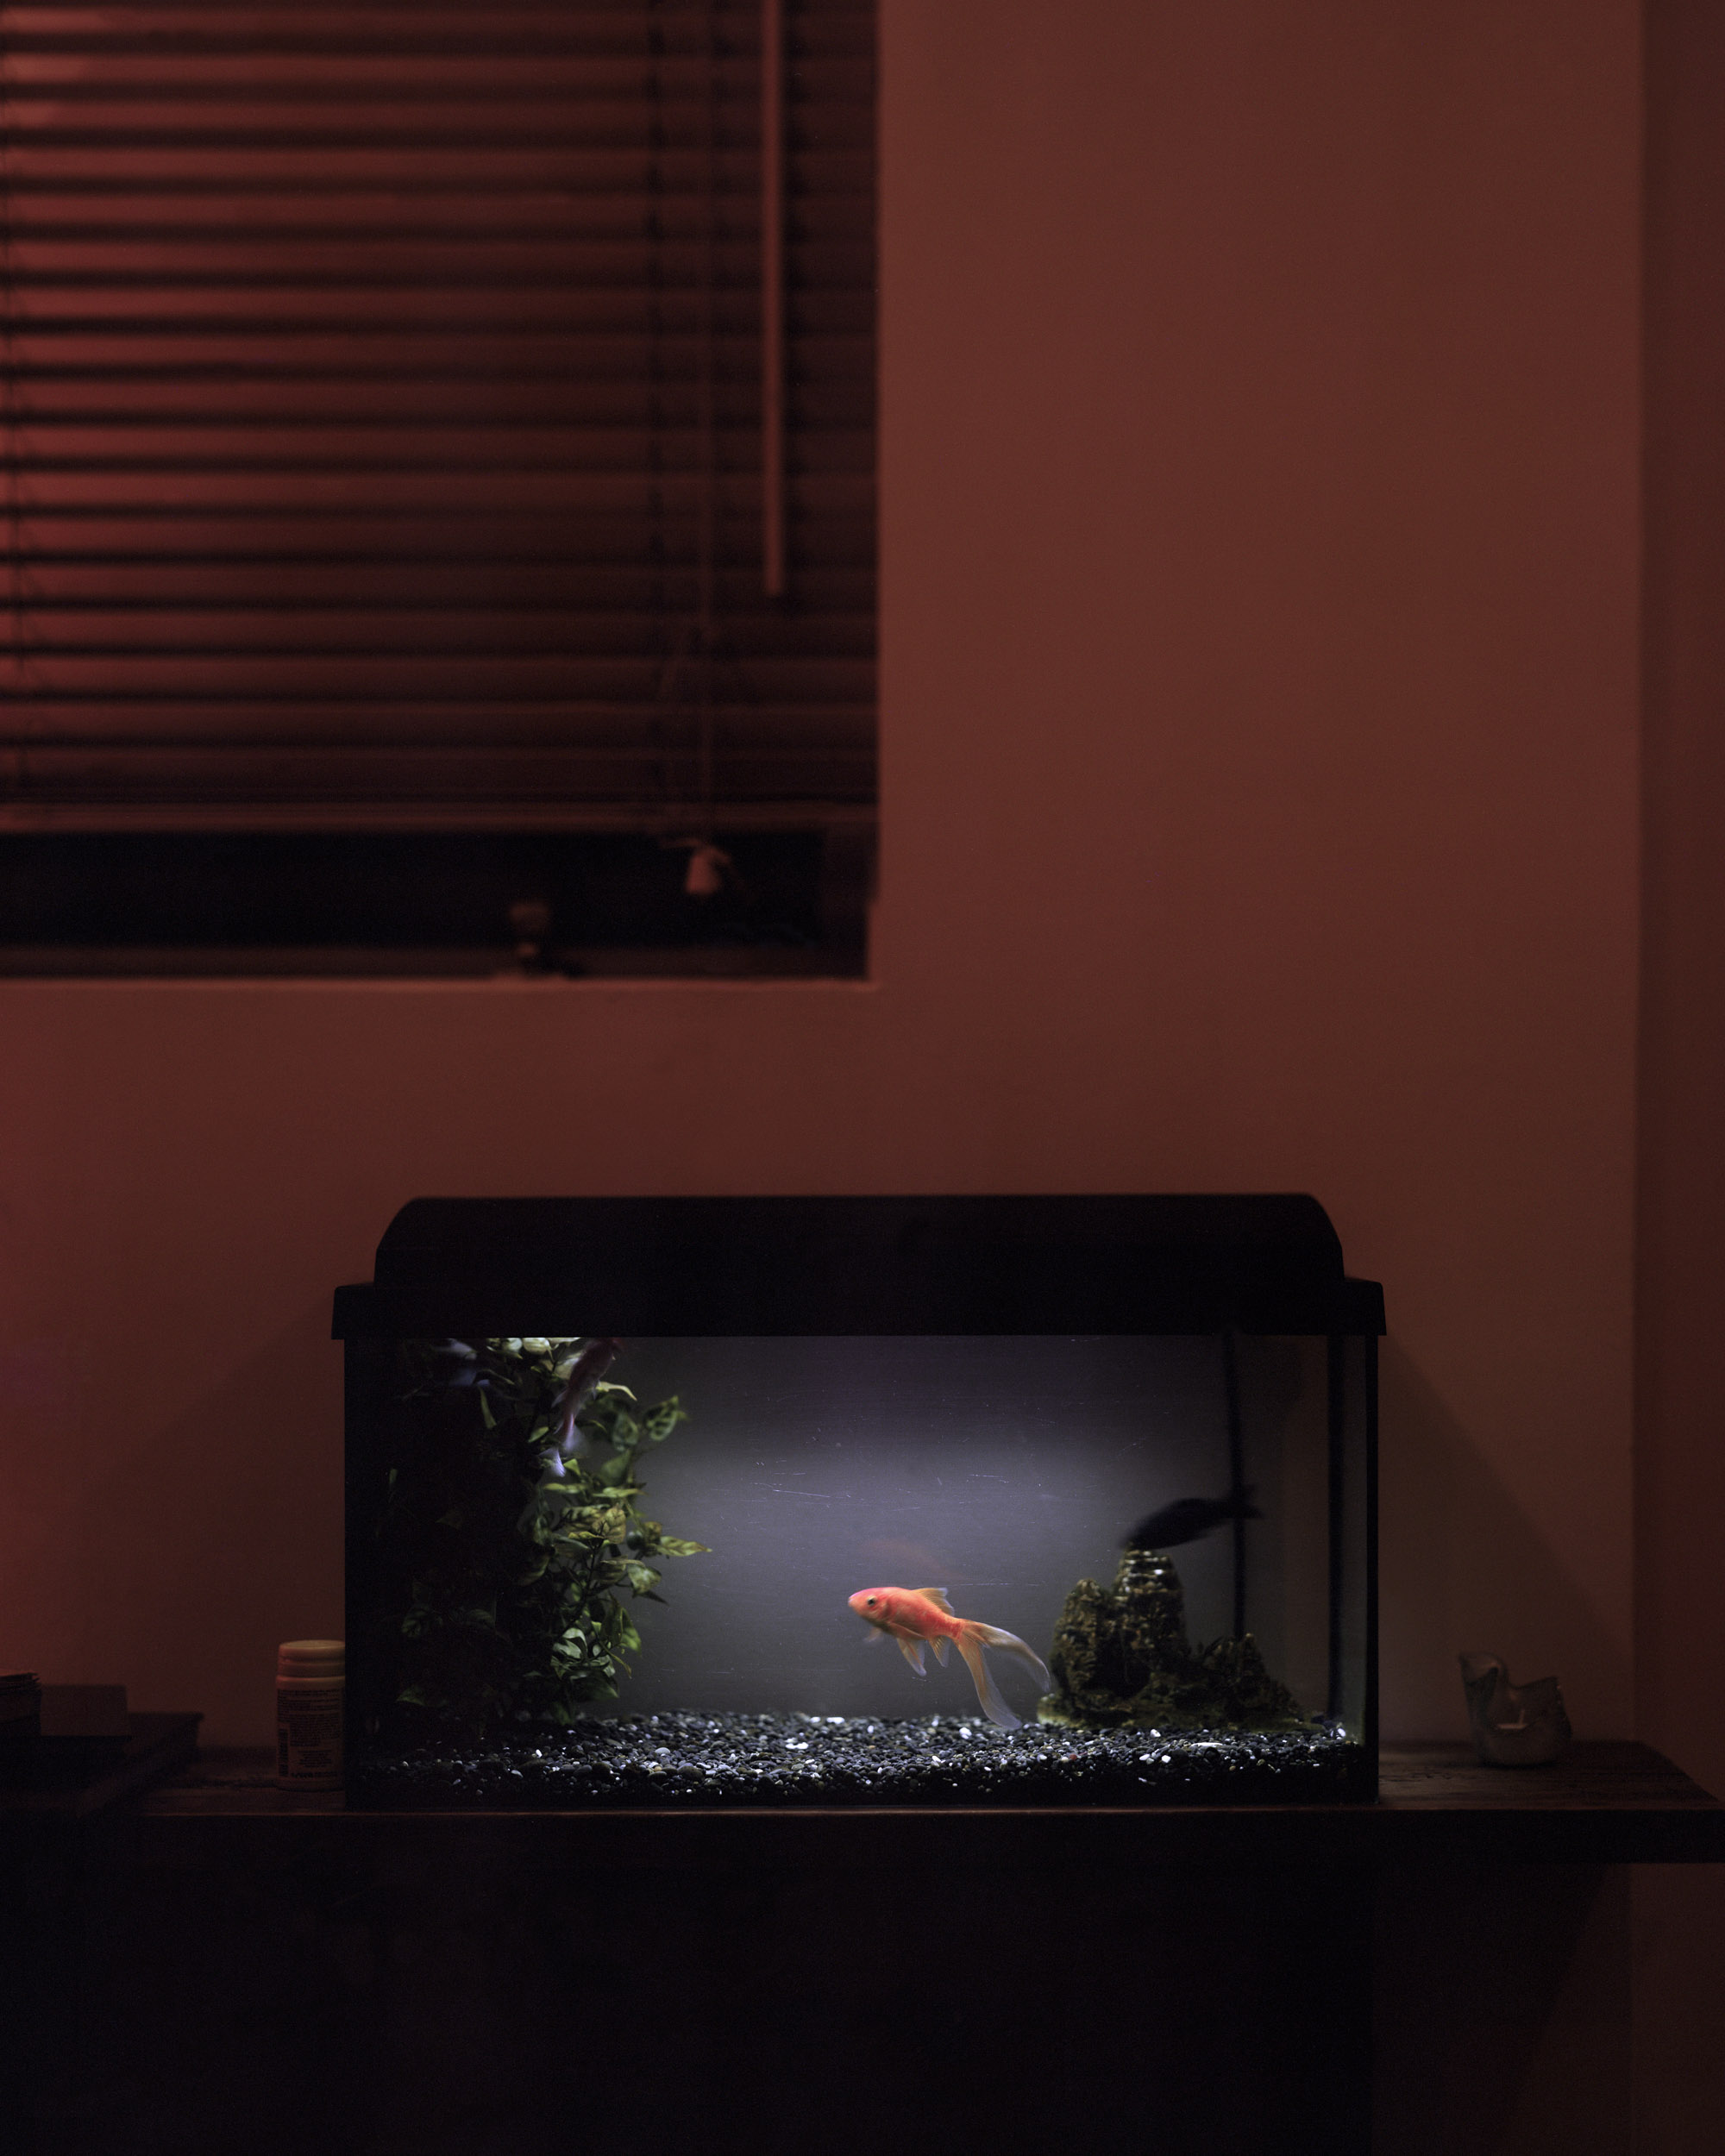 Erla's Goldfish